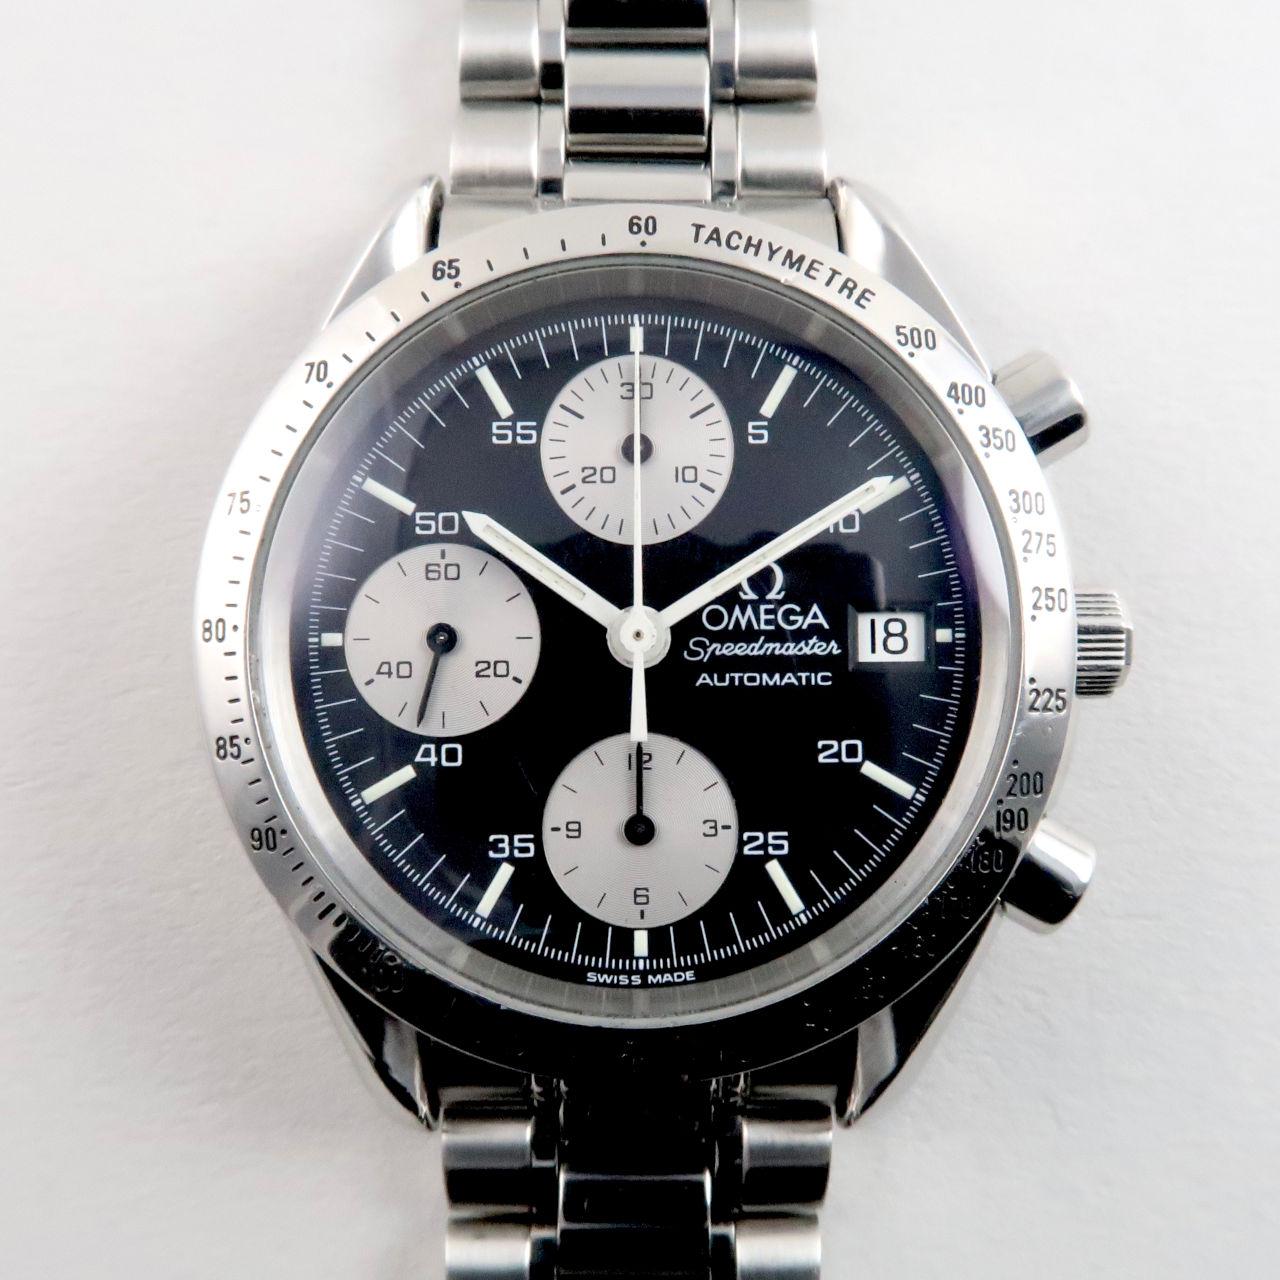 omega-speedmaster-reduced-ref-175-0043-steel-vintage-wristwatch-circa-1991-wxosbd-v101